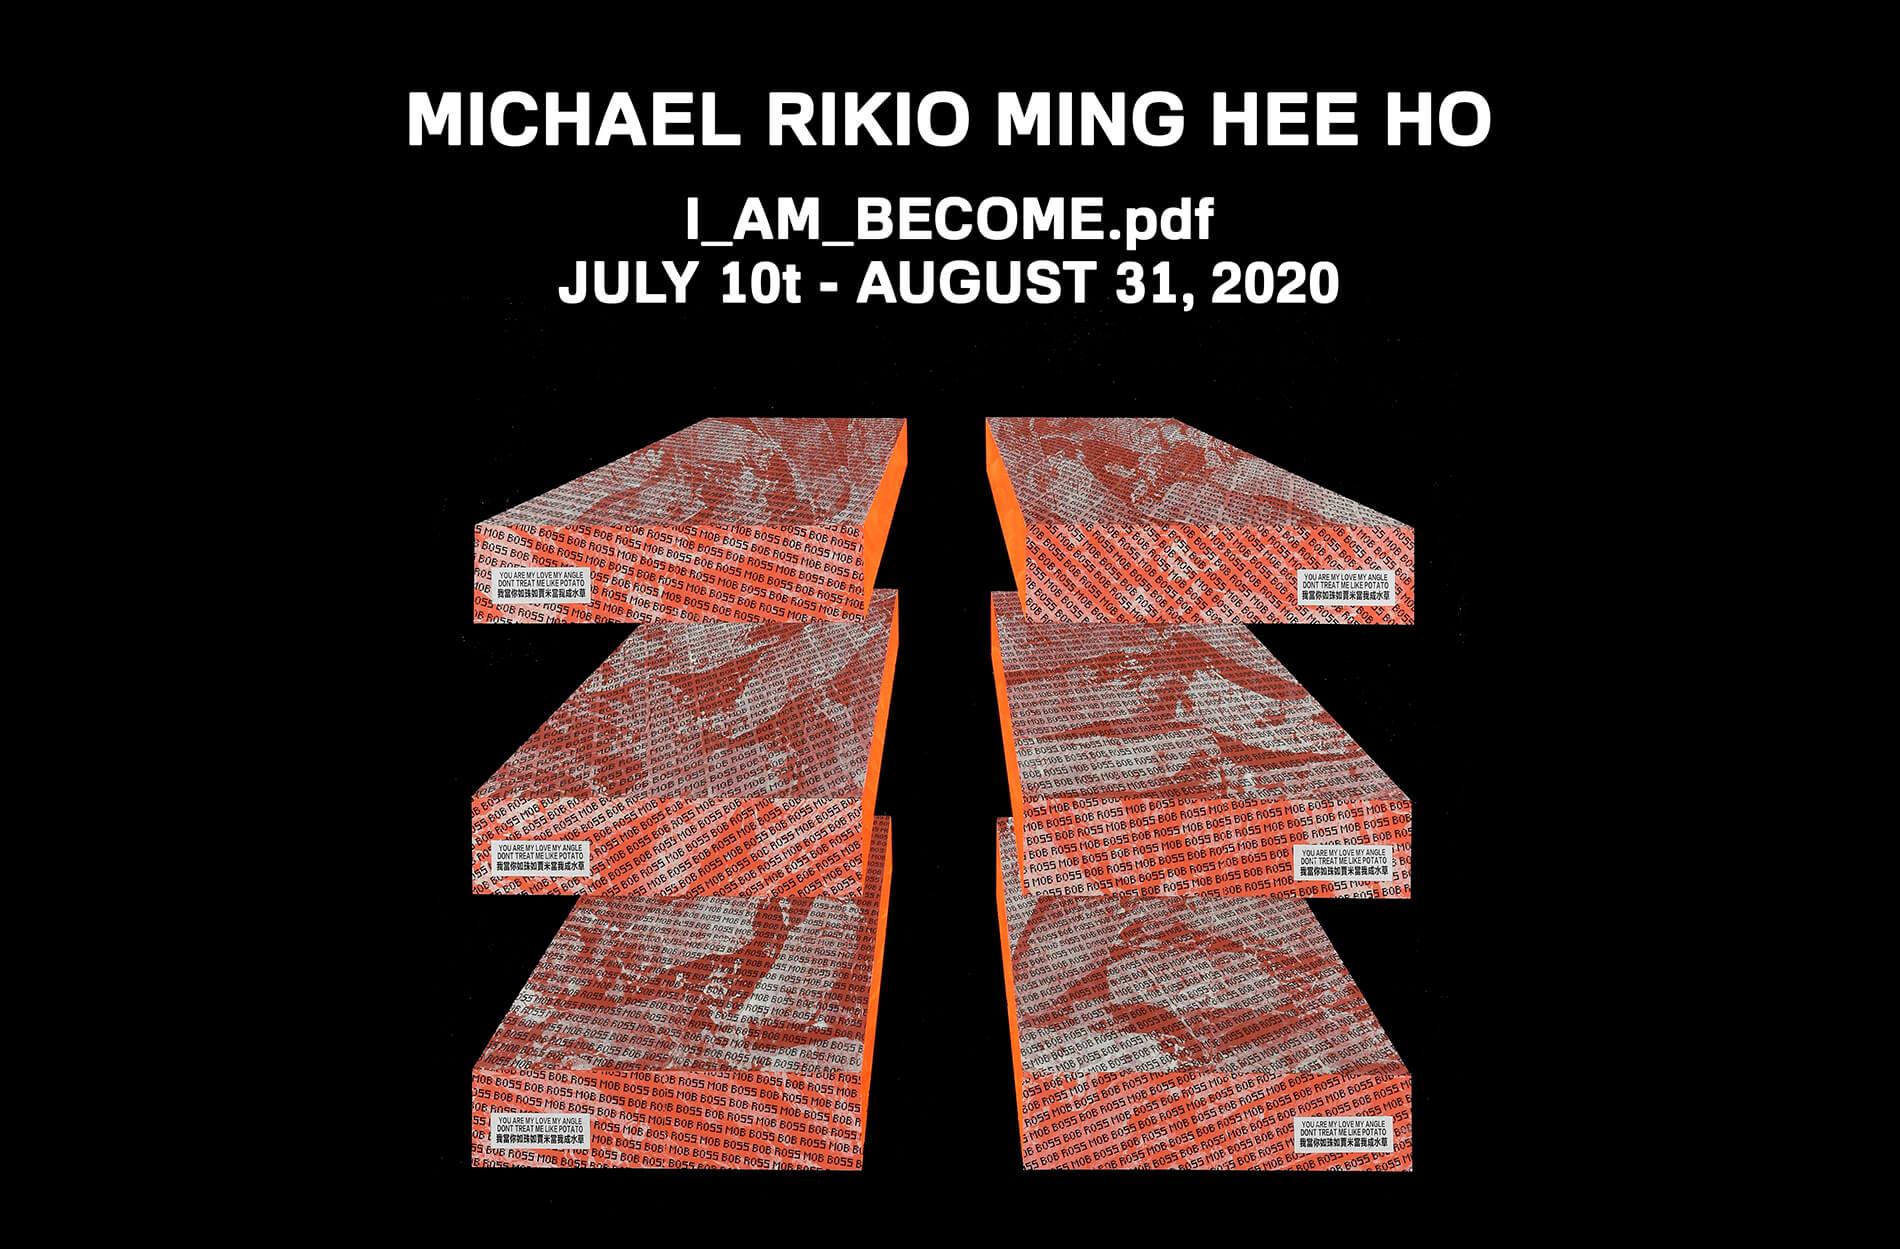 MICHAEL RIKIO MING HEE HO I_AM_BECOME.pdf JULY 10 AUGUST 31, 2020